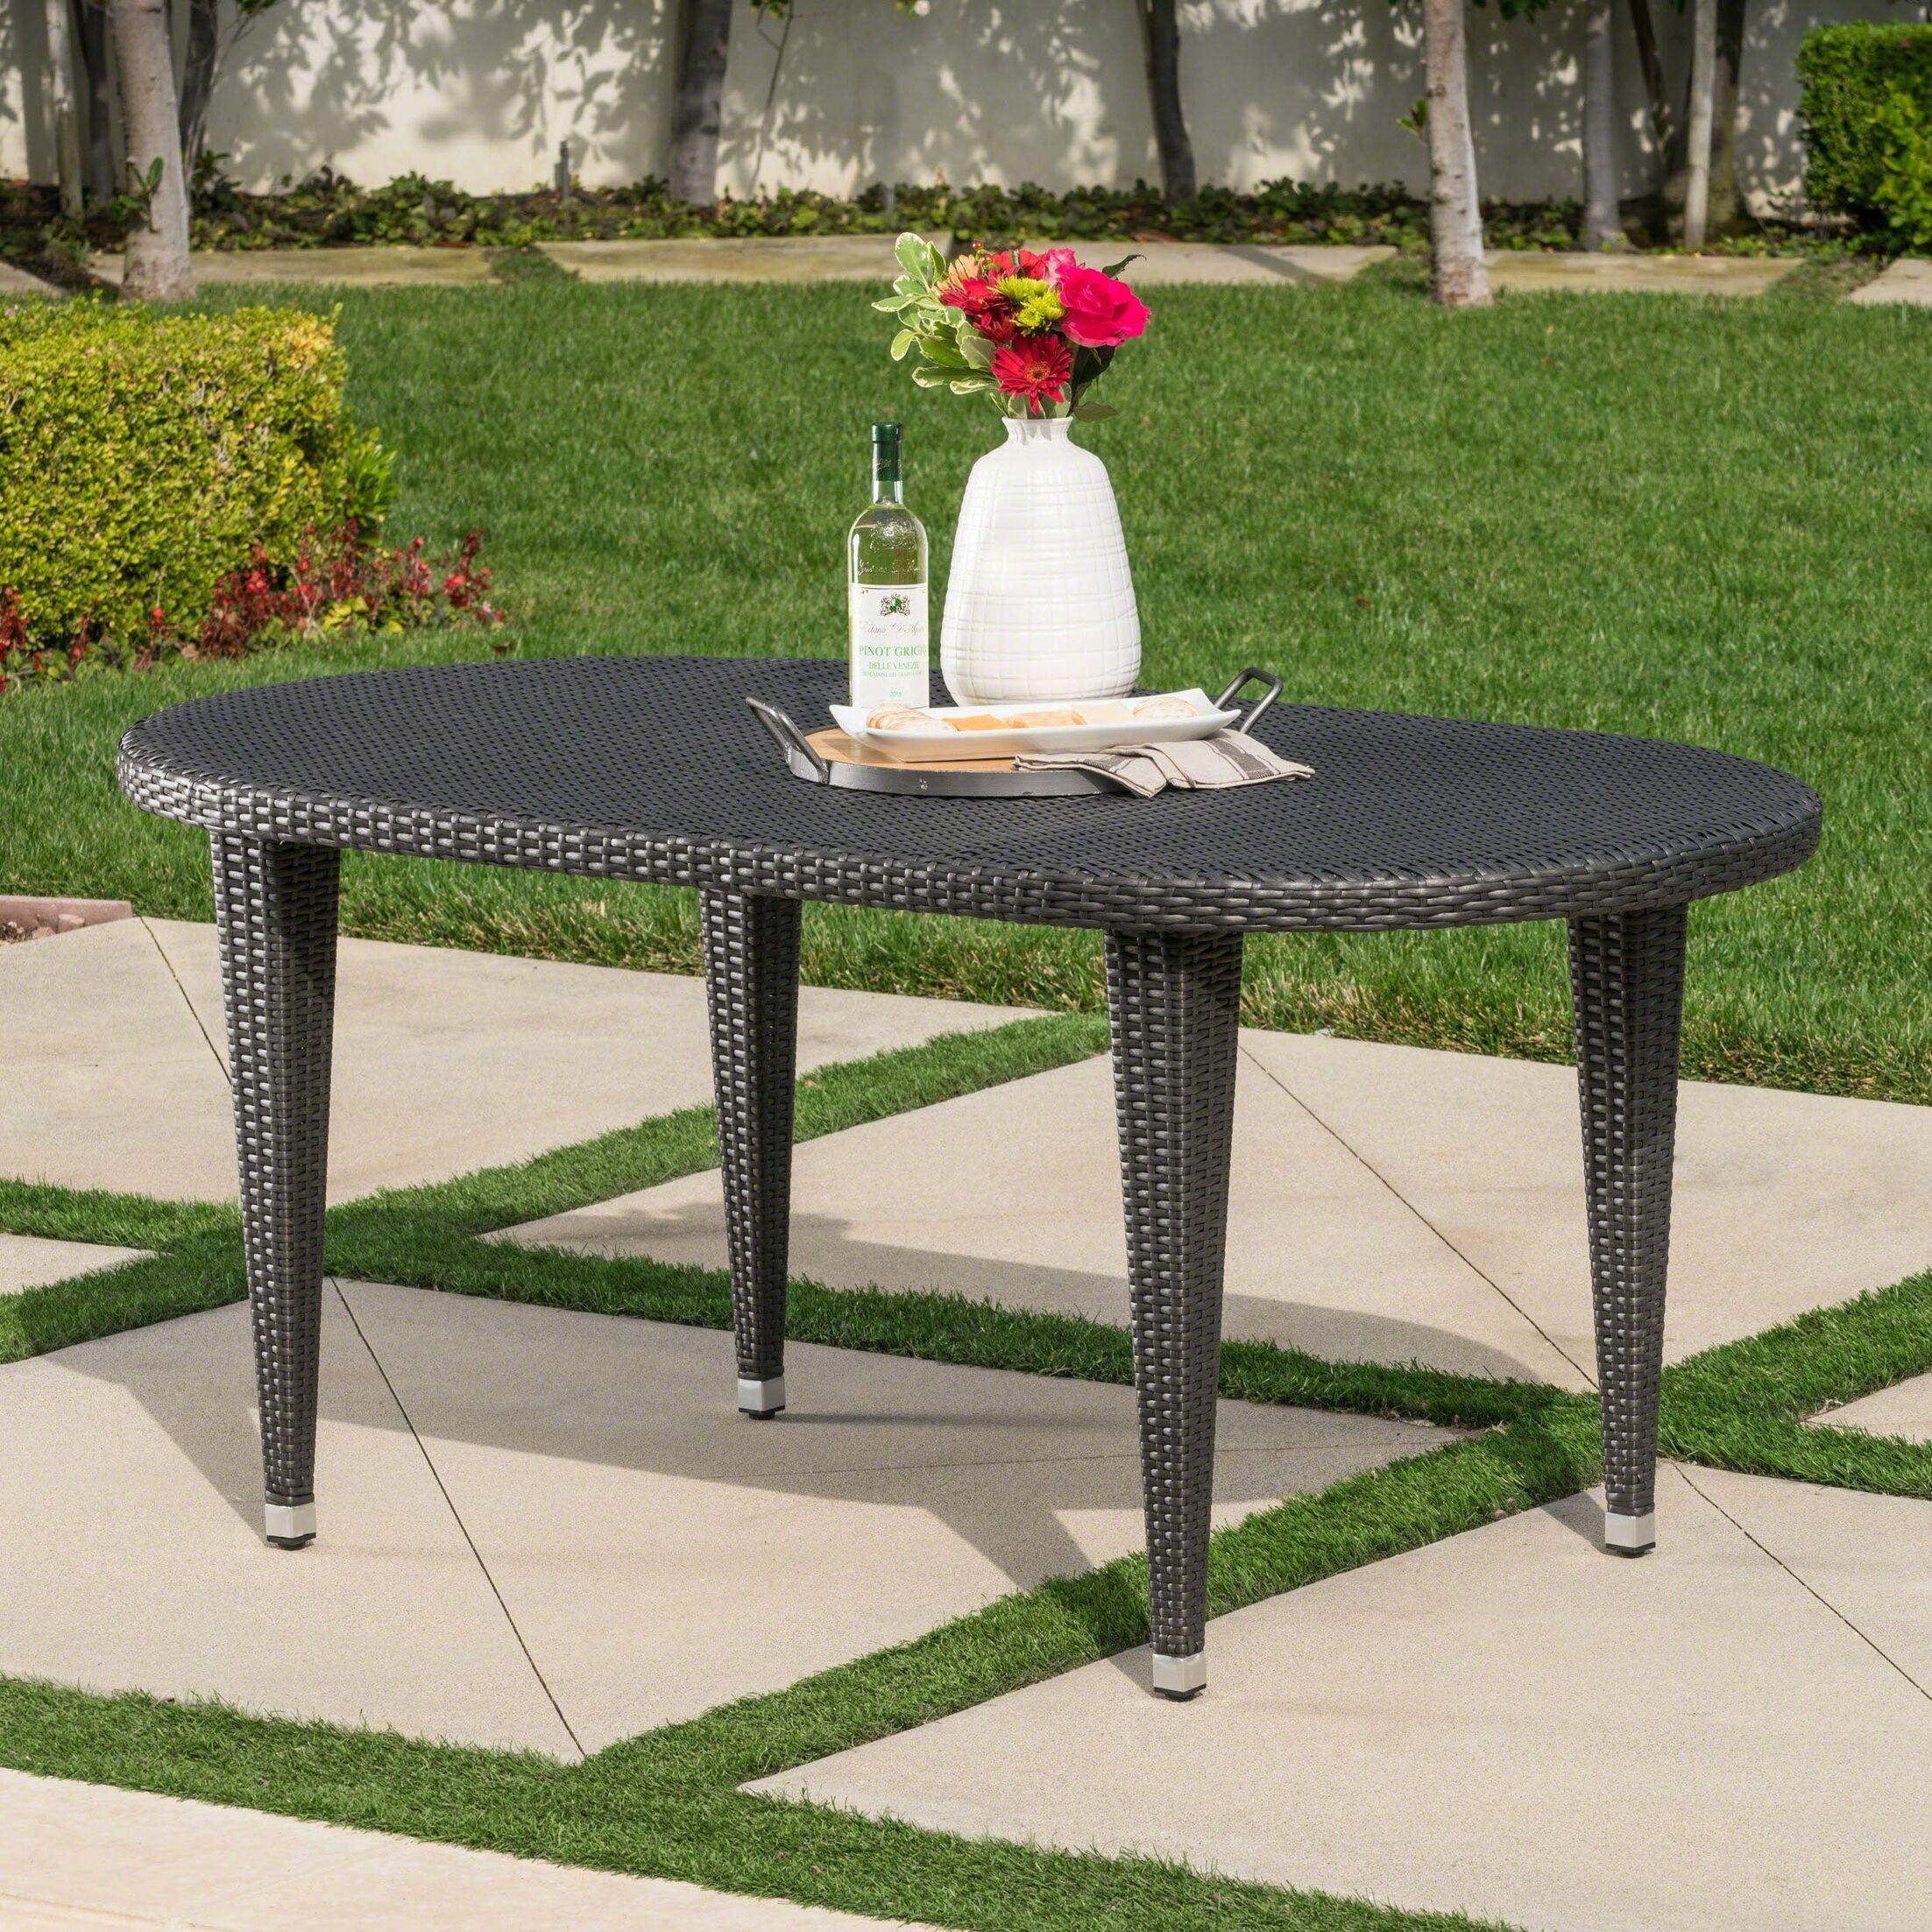 Gwendoline Outdoor Wicker Dining Table Color: Grey